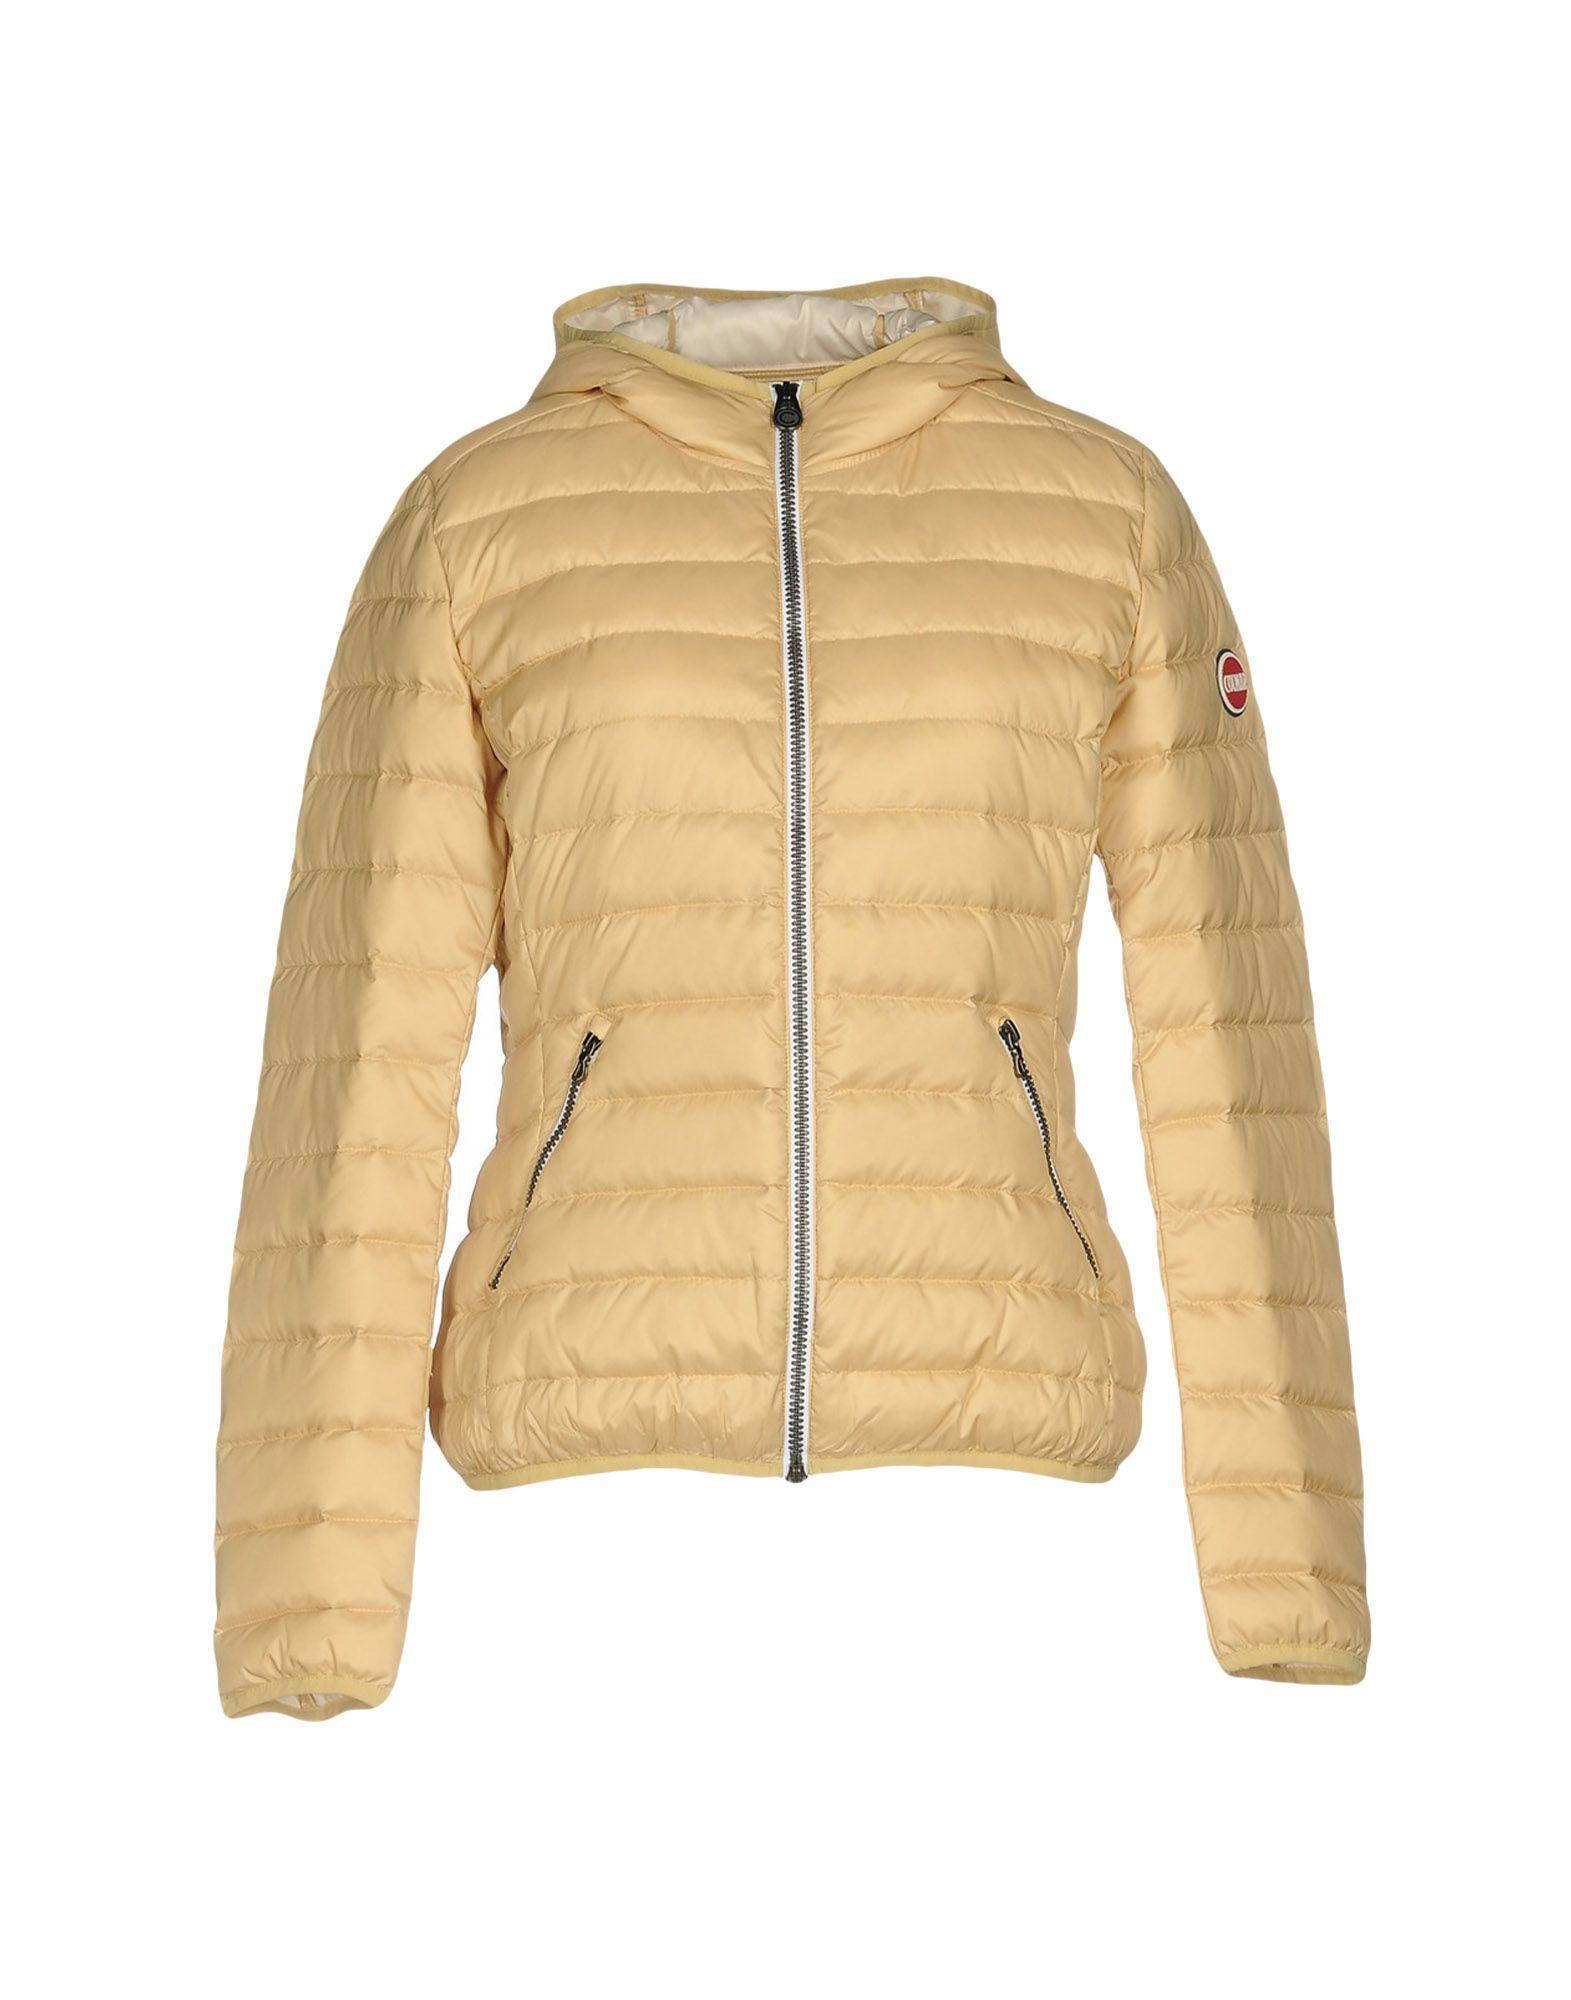 Colmar Originals Down Jackets In Yellow